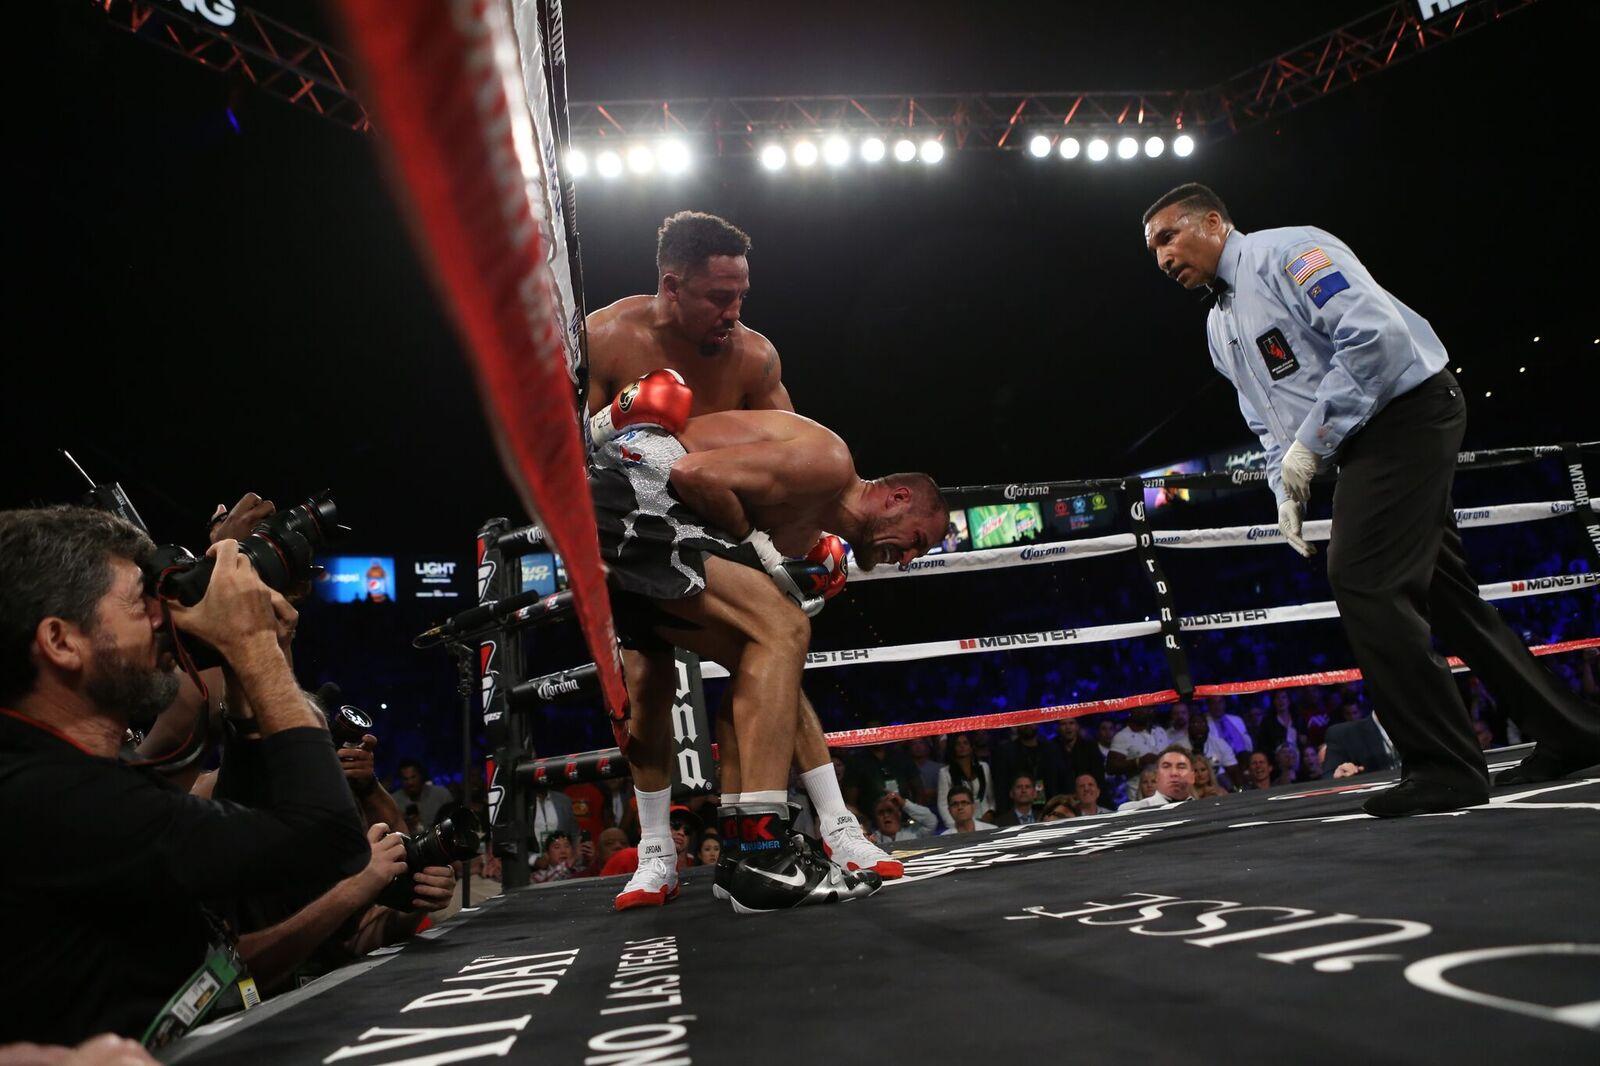 andre ward vs sergey kovalev 2 ringside recap post press